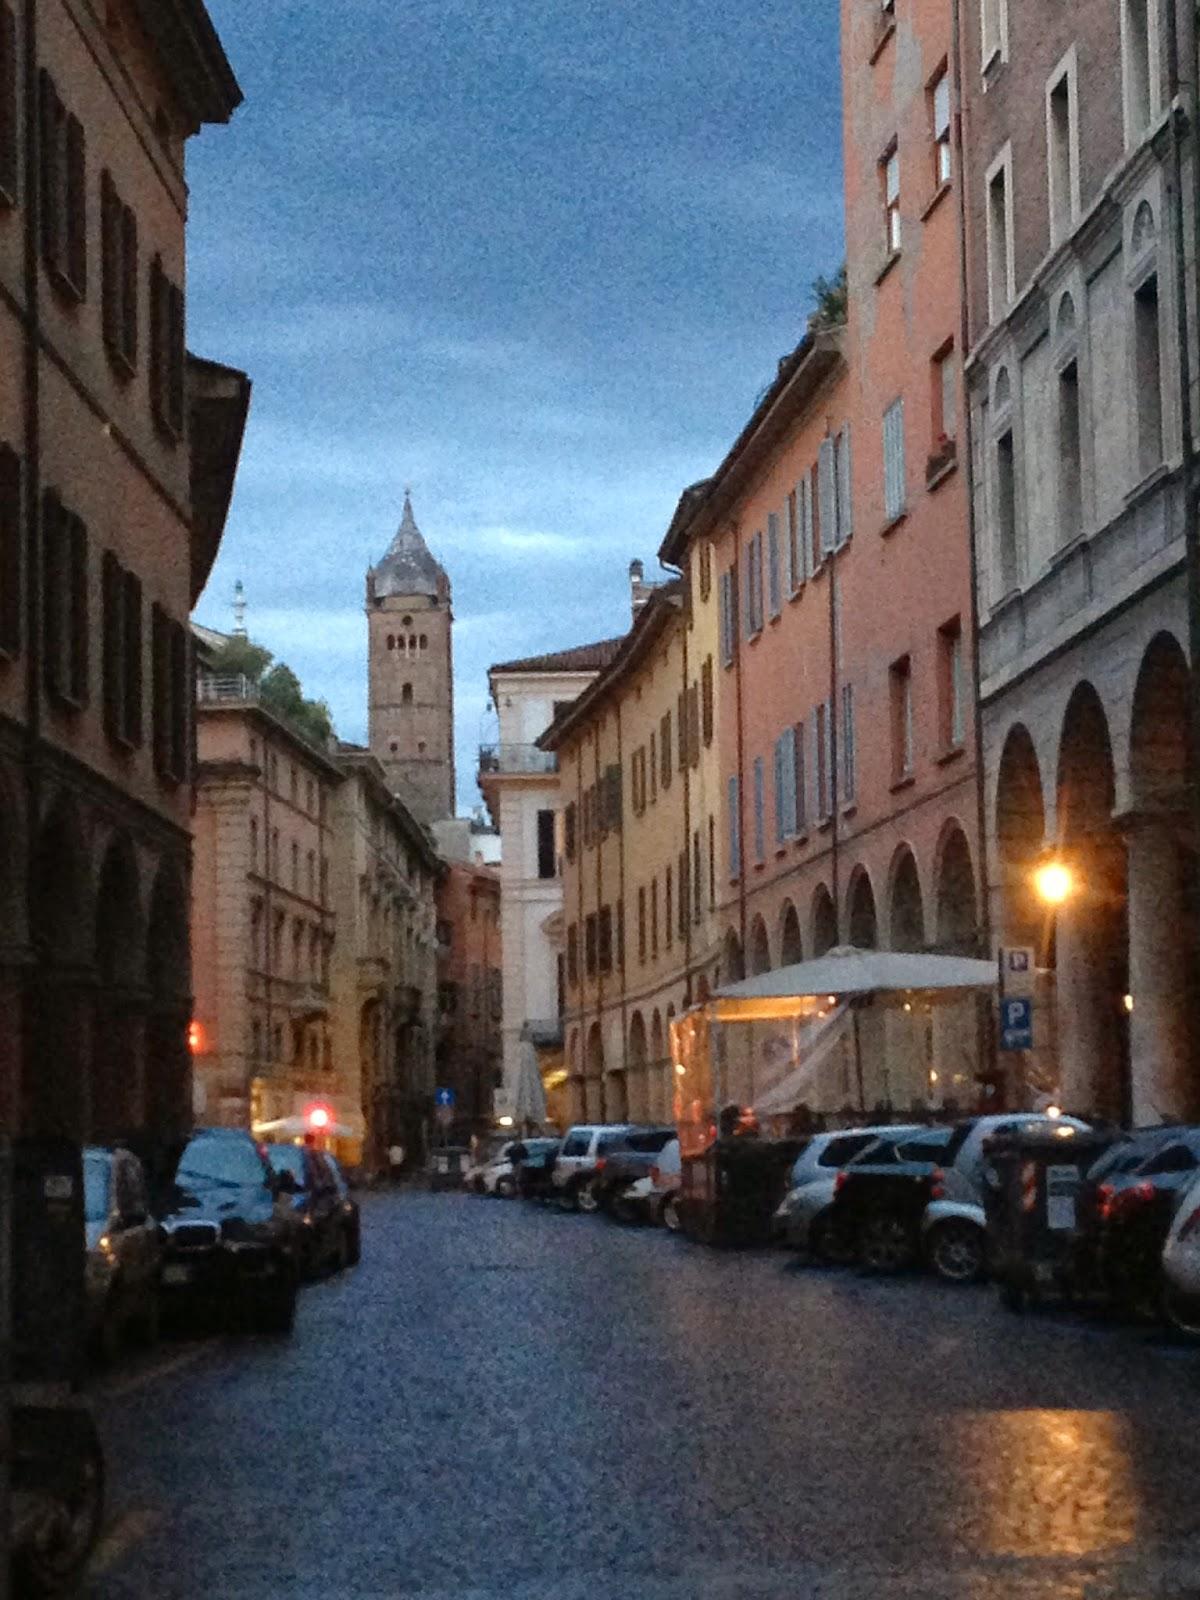 Taste of Italy: Summer in Bologna